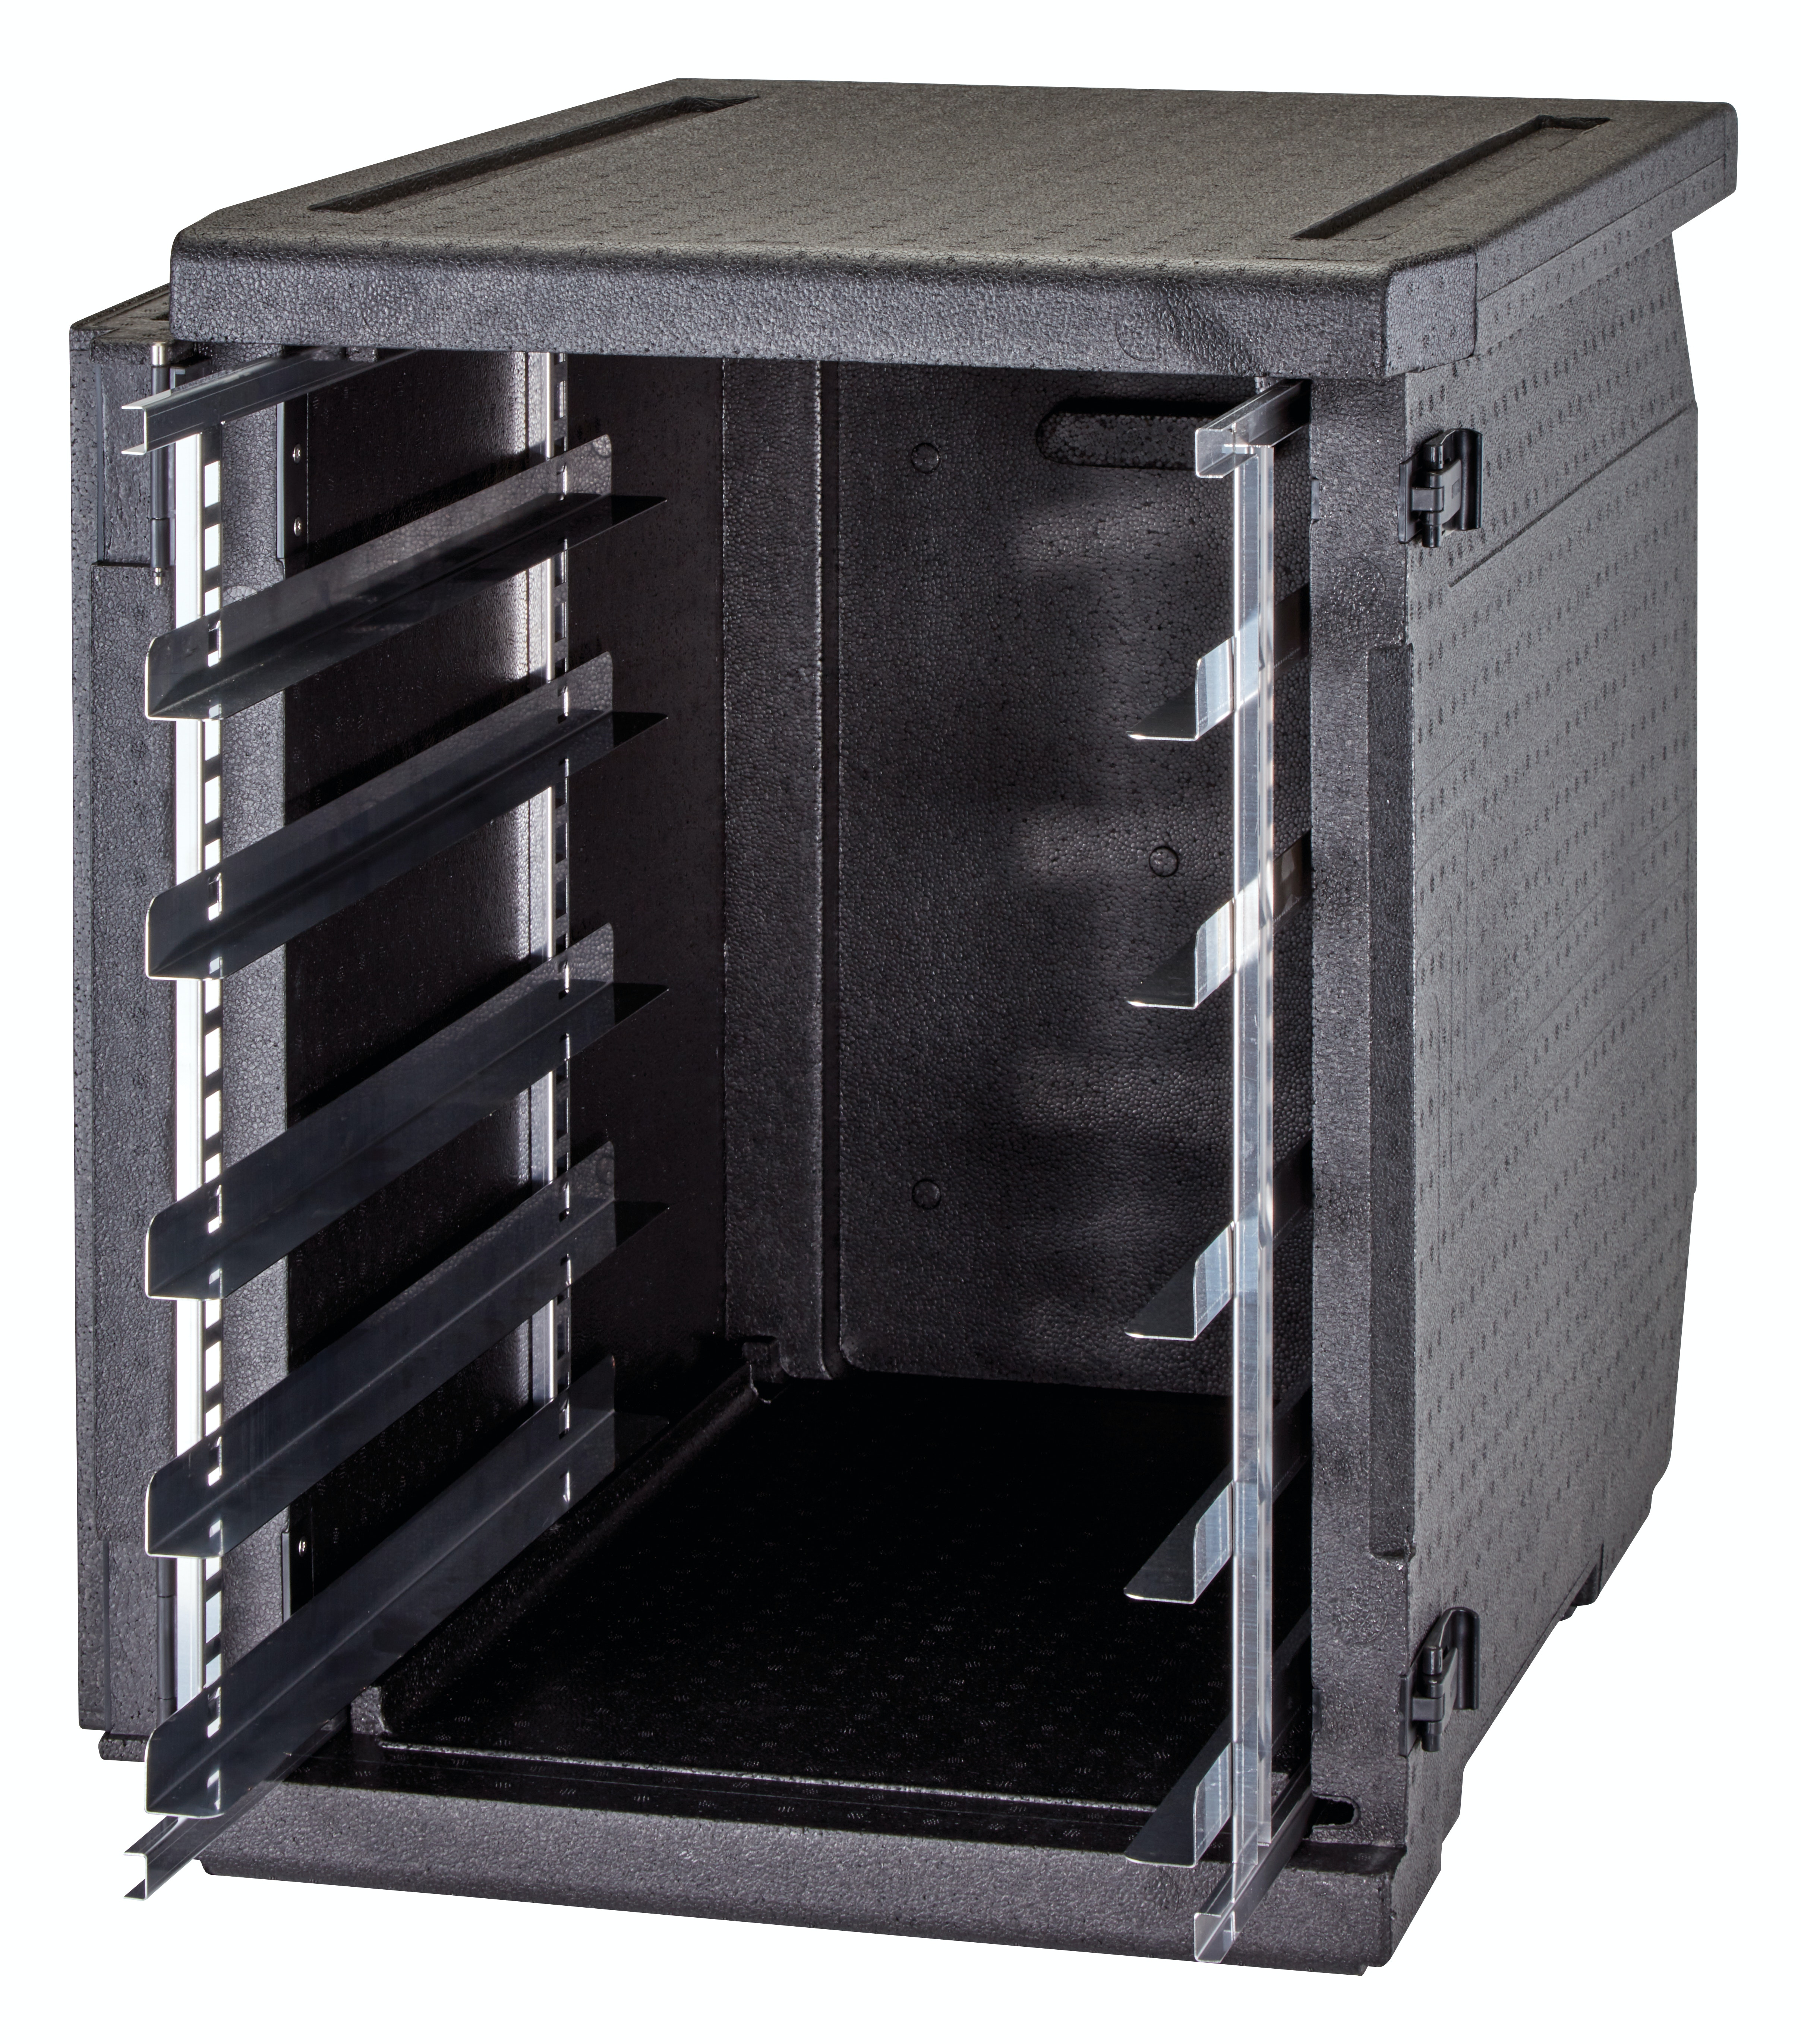 - Negro 53 L - 42,5 x 62,5 x 20,5 cm M.Int CAMBRO Contenedor isot/érmico con carga superior Cam Gobox para bandejas de 60x40 cm y 20 cm prof M.Ext 49 x 69 x 27 cm